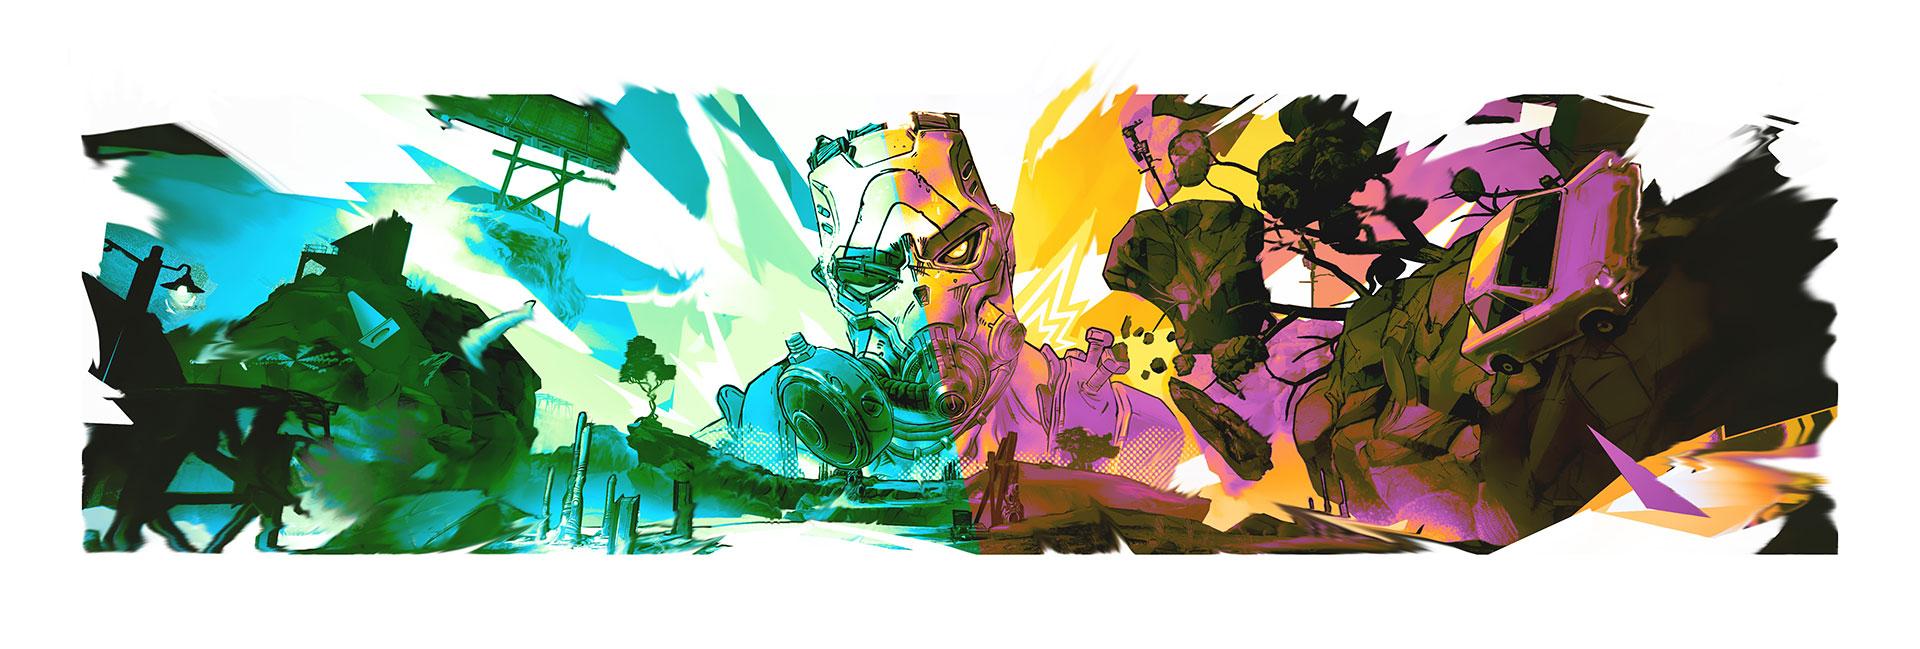 dlc4_art-full.jpg?size=original